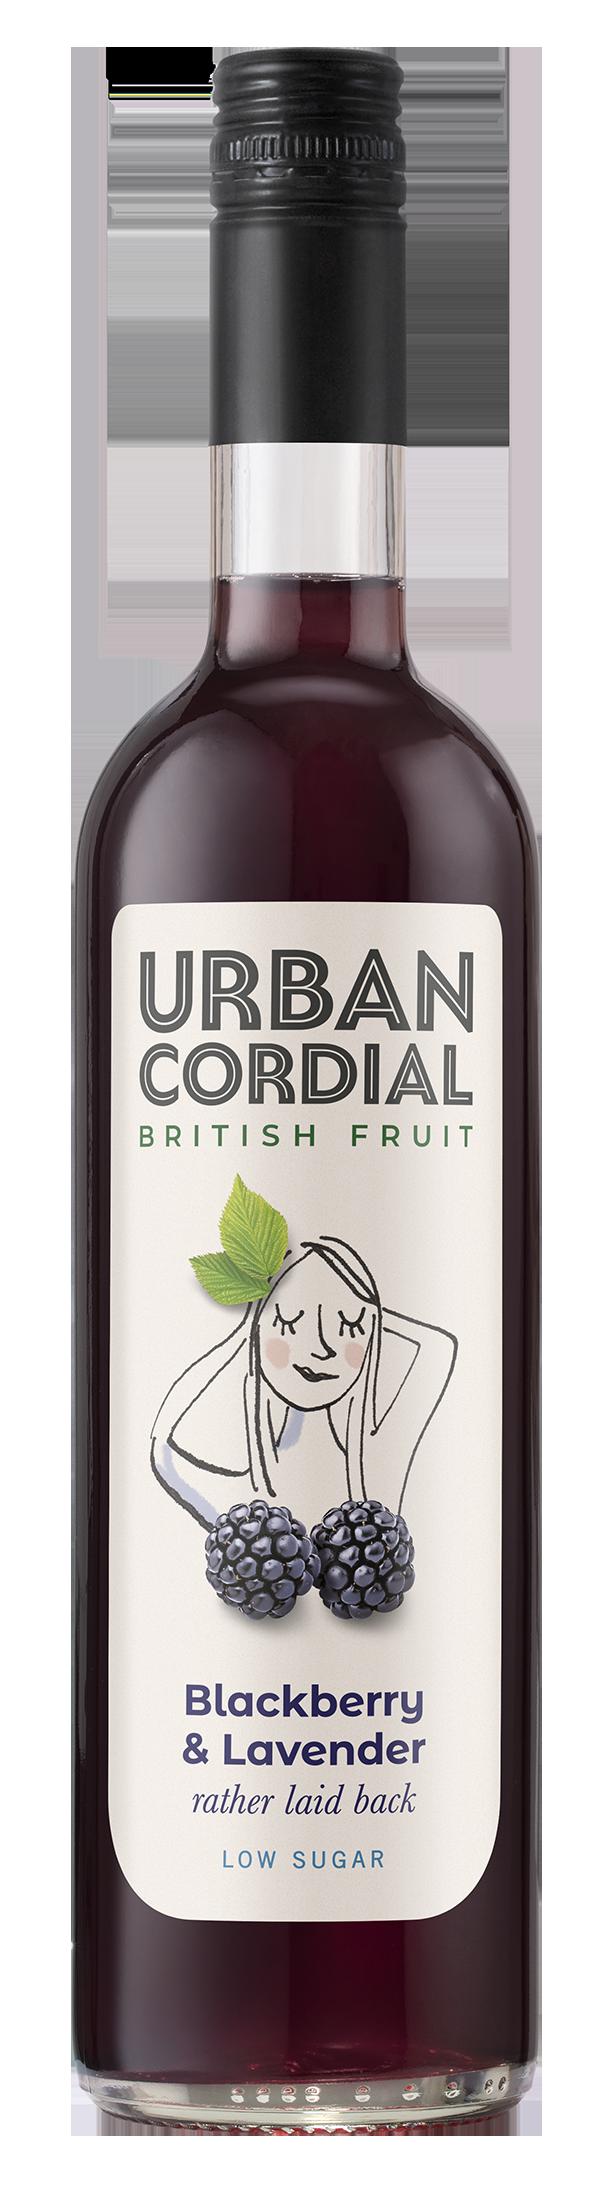 Blackberry & Lavender Cordial by Urban Cordial 500ml